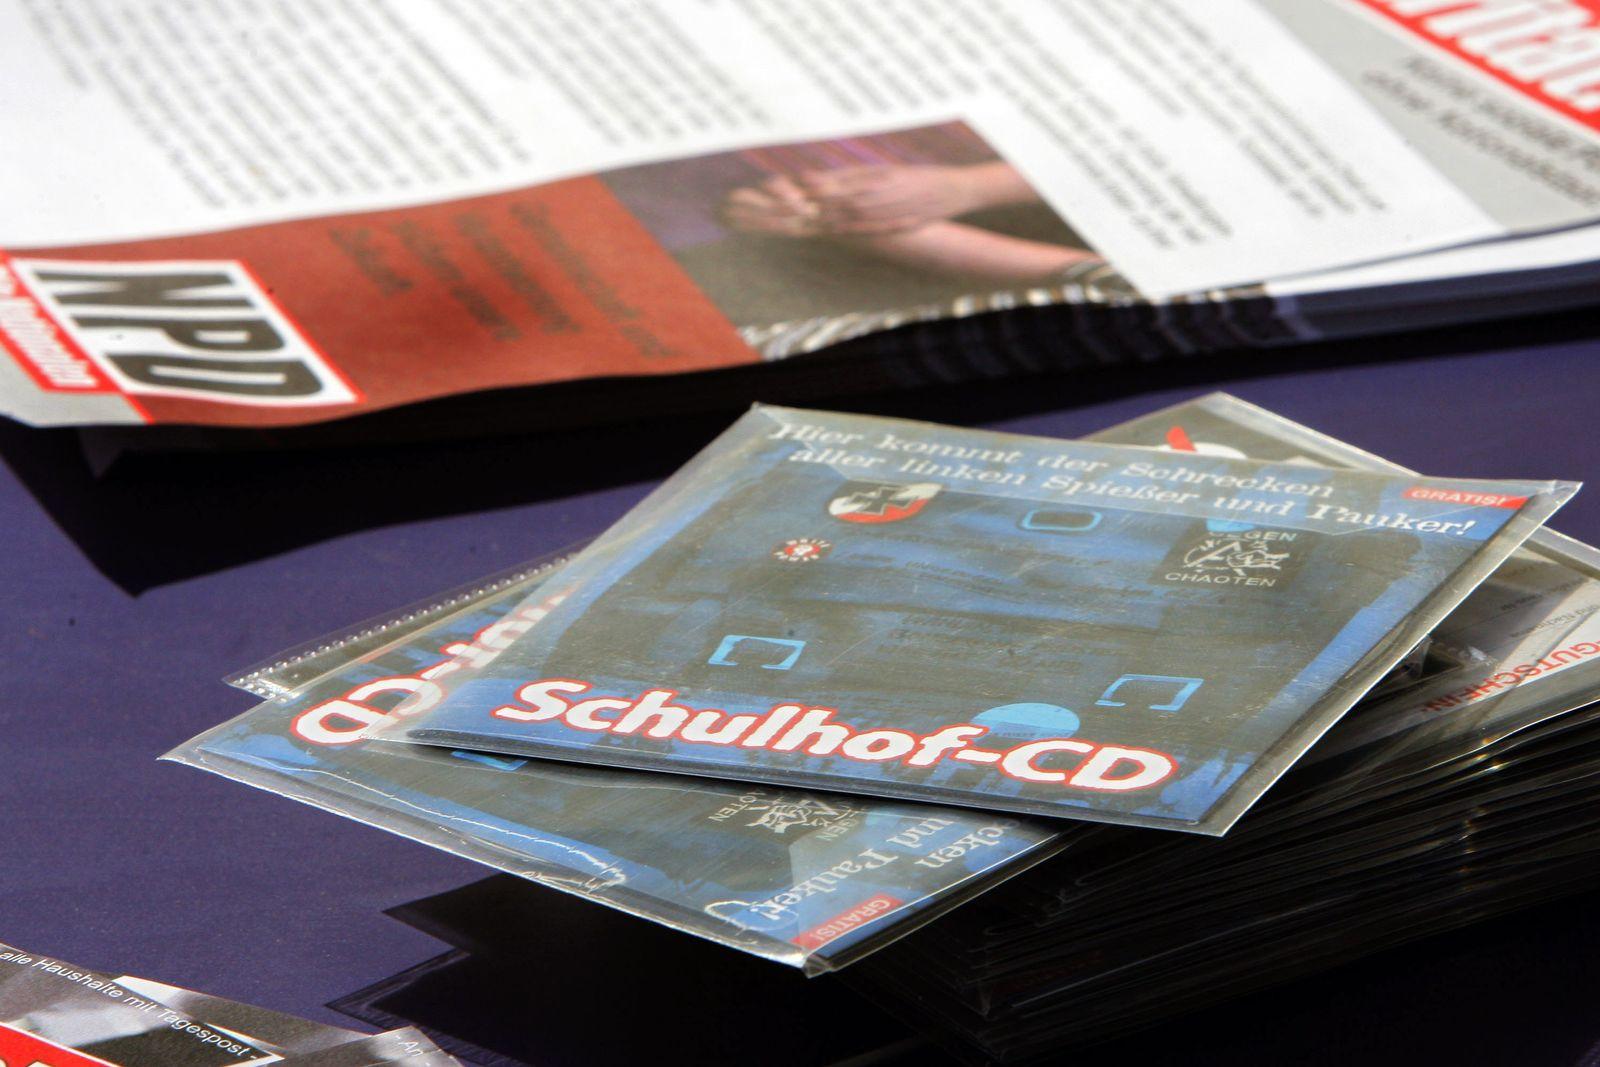 Schulhof-CD's / NPD